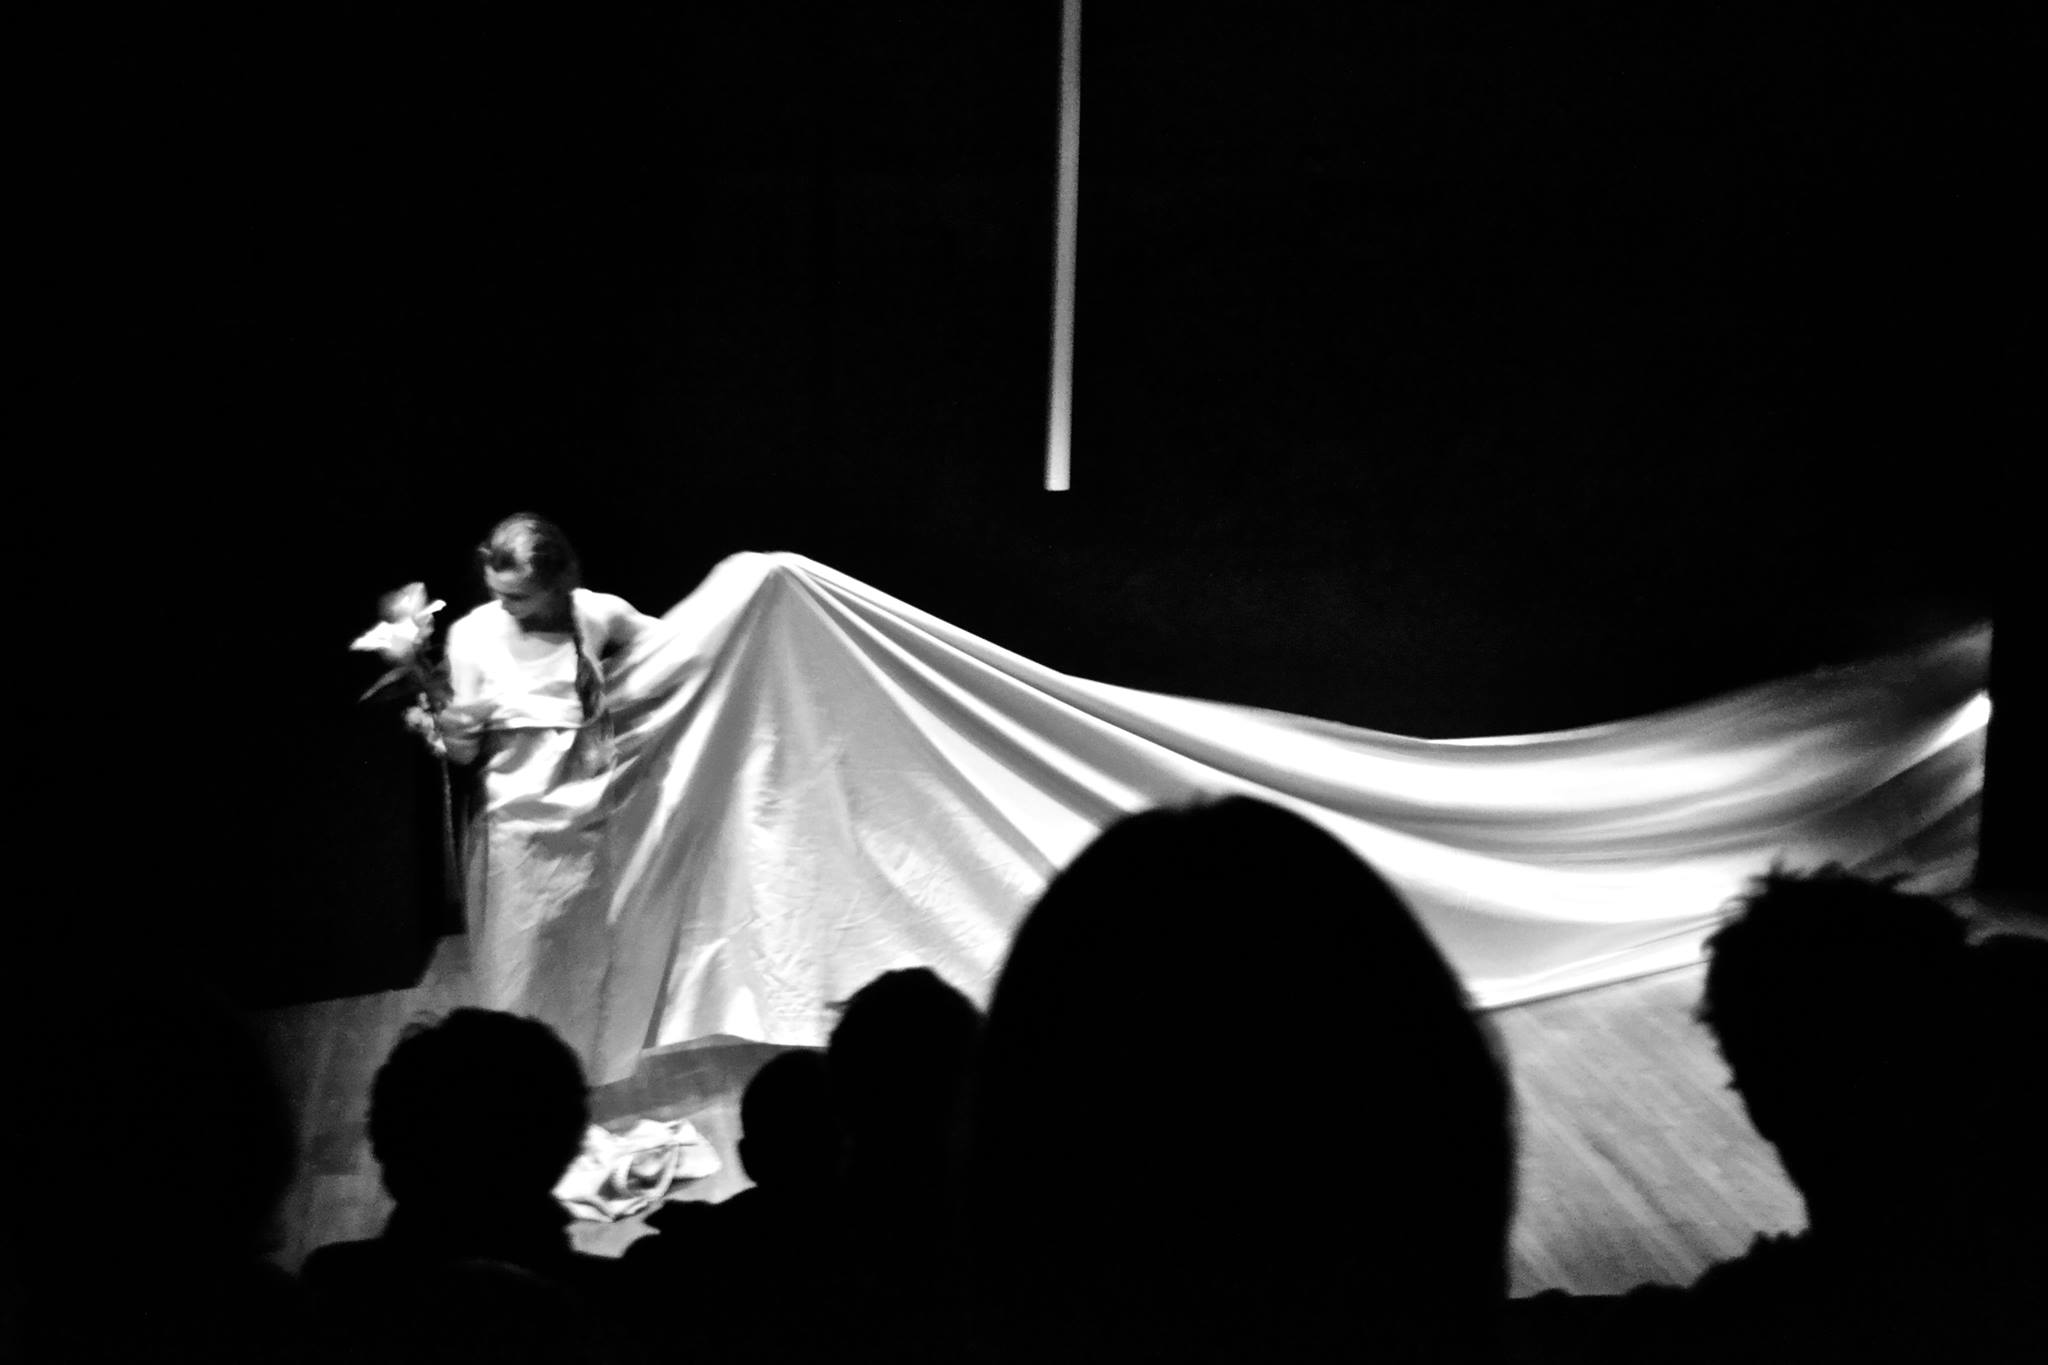 bn teatro Bixio 0